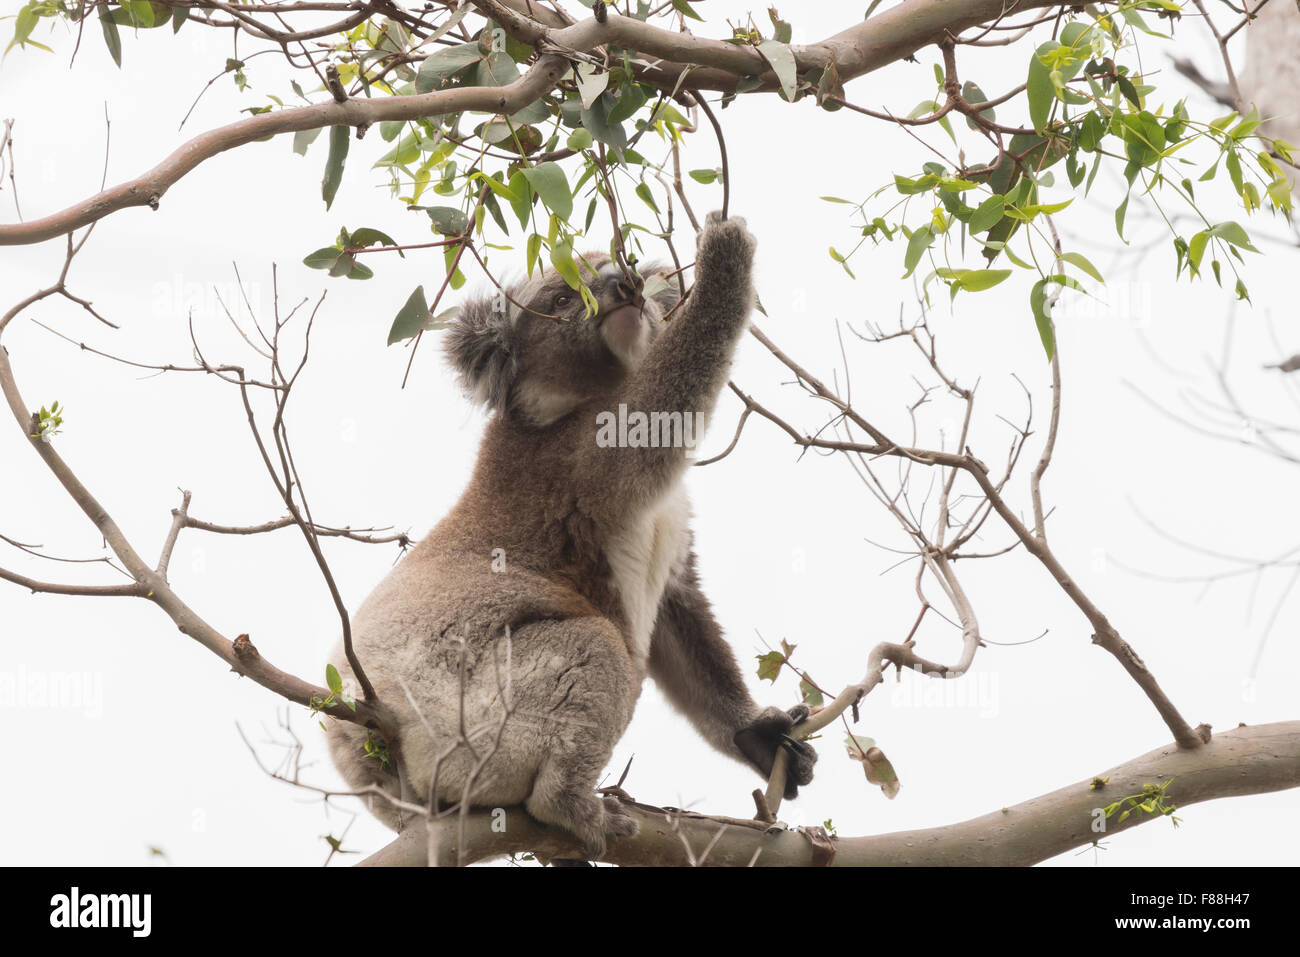 Koala picking eucalyptus leaves to eat - Stock Image